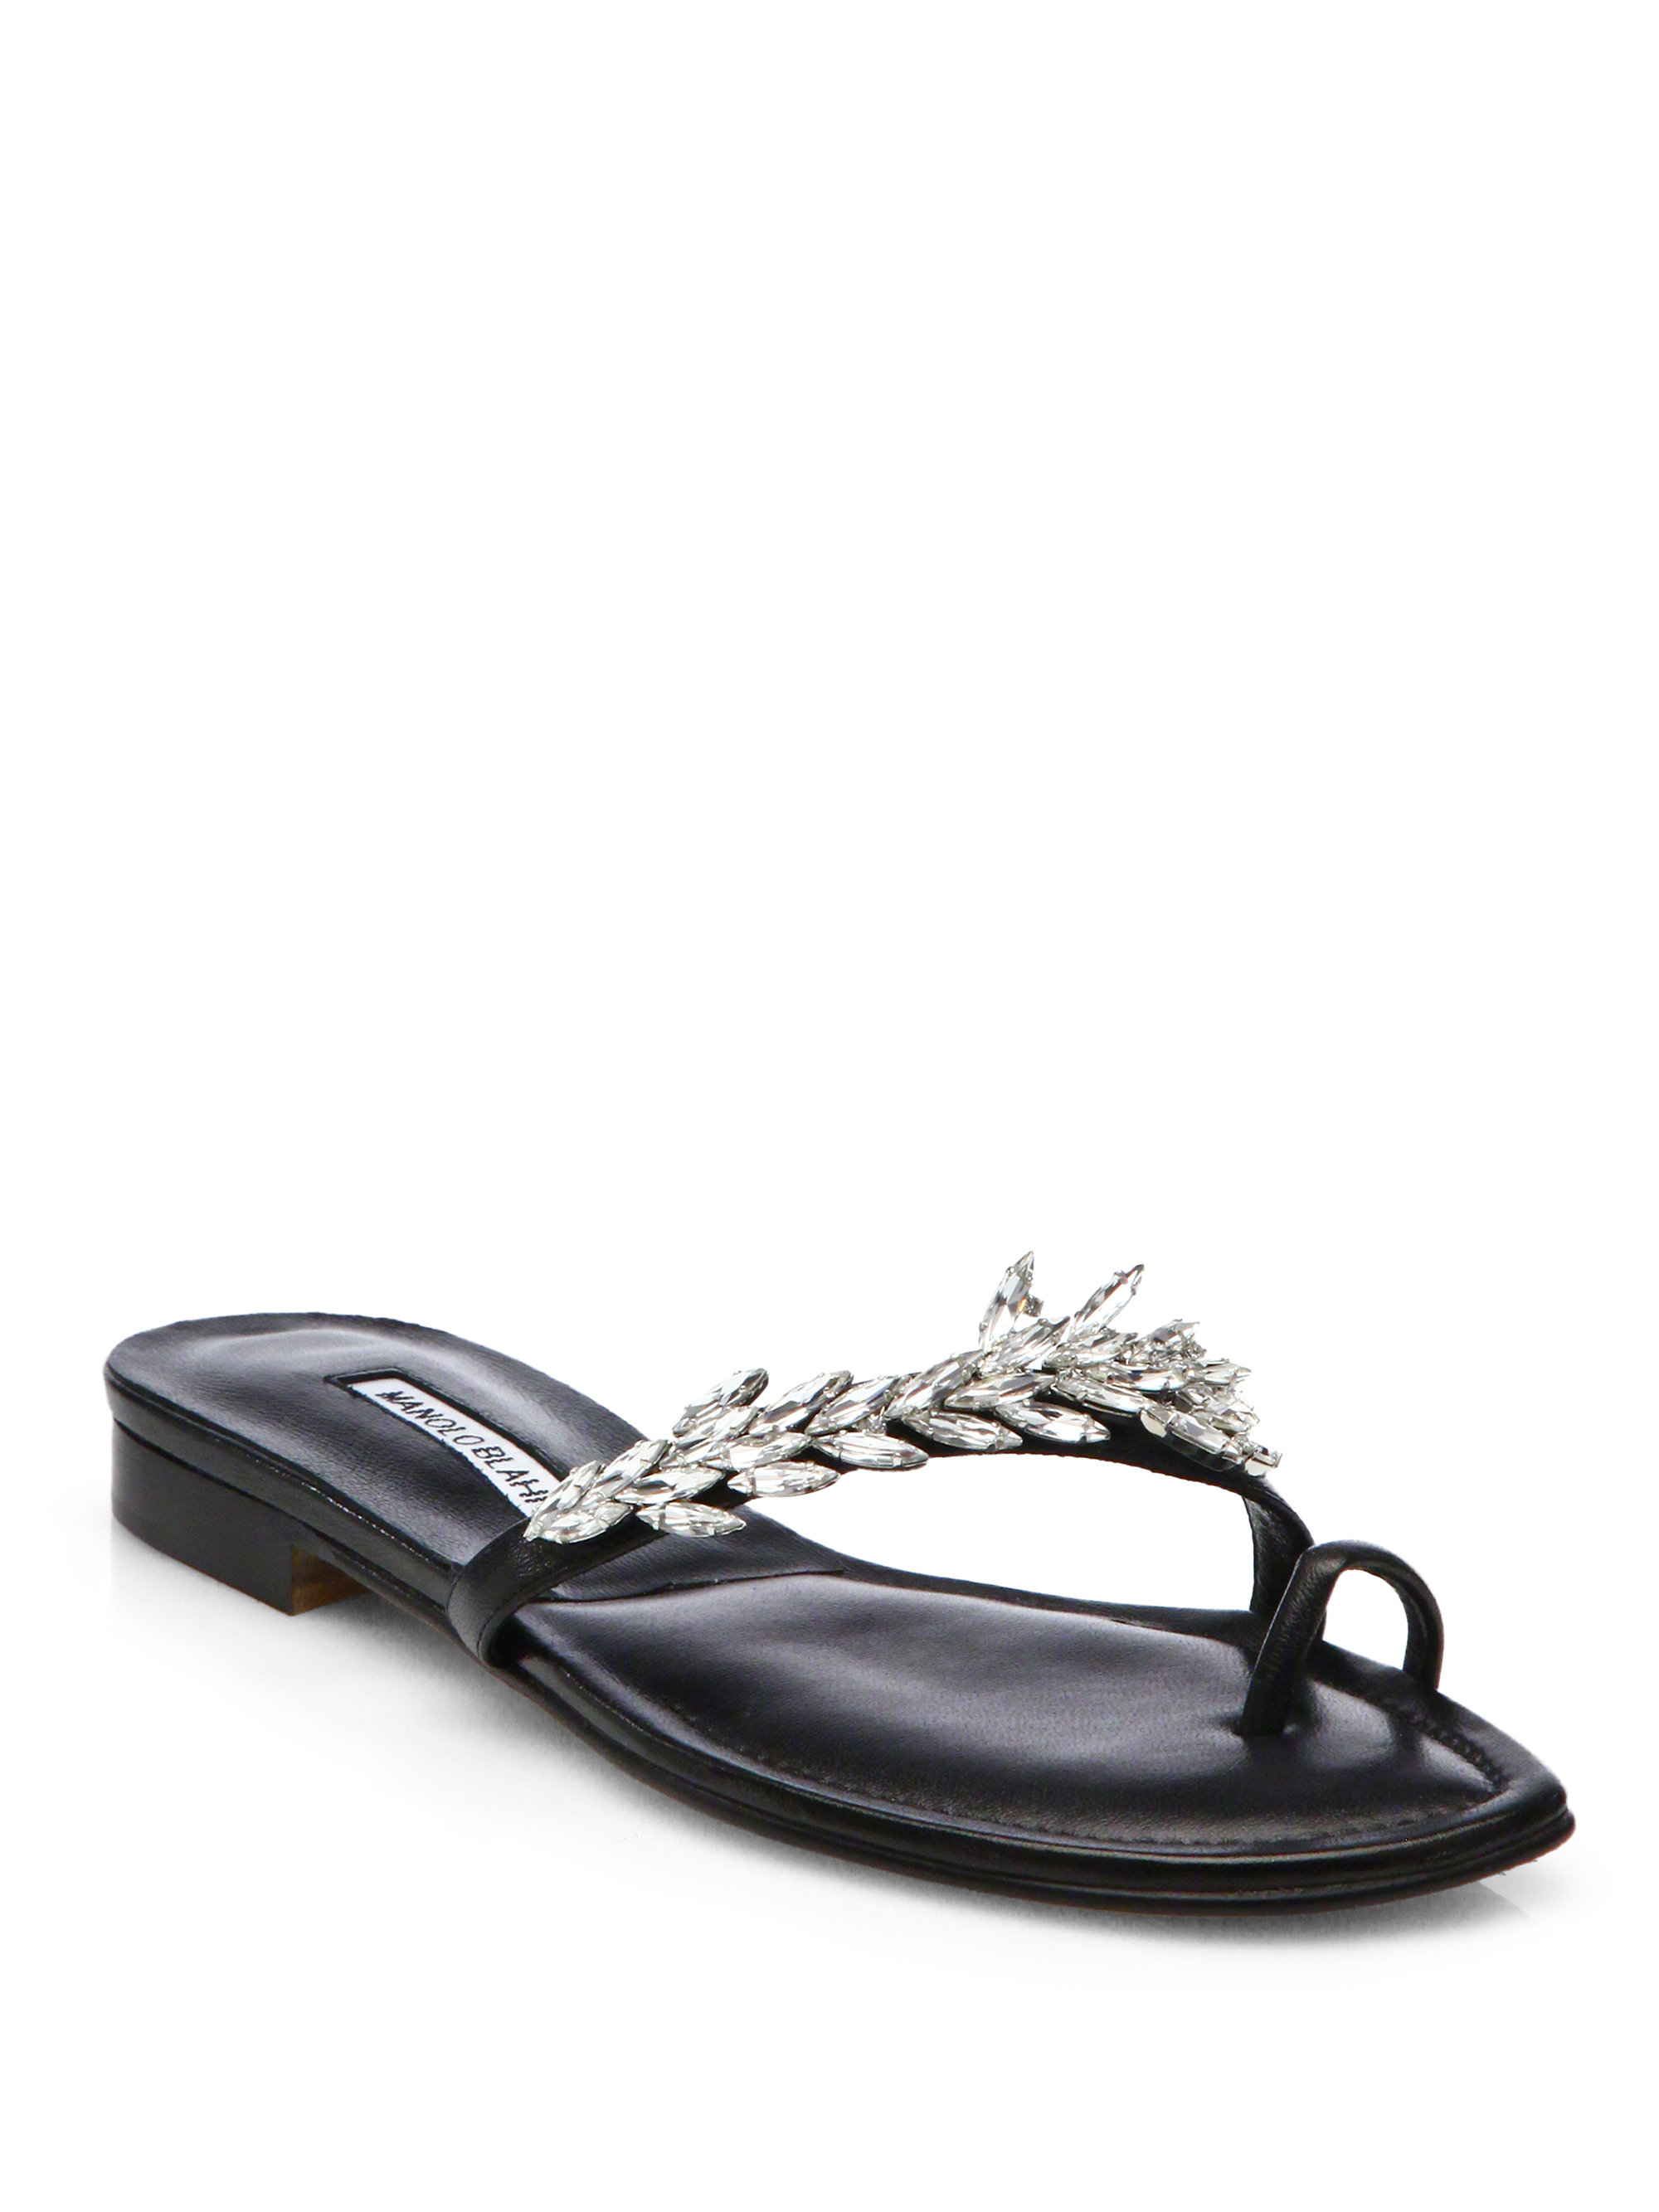 manolo blahnik sandals flats